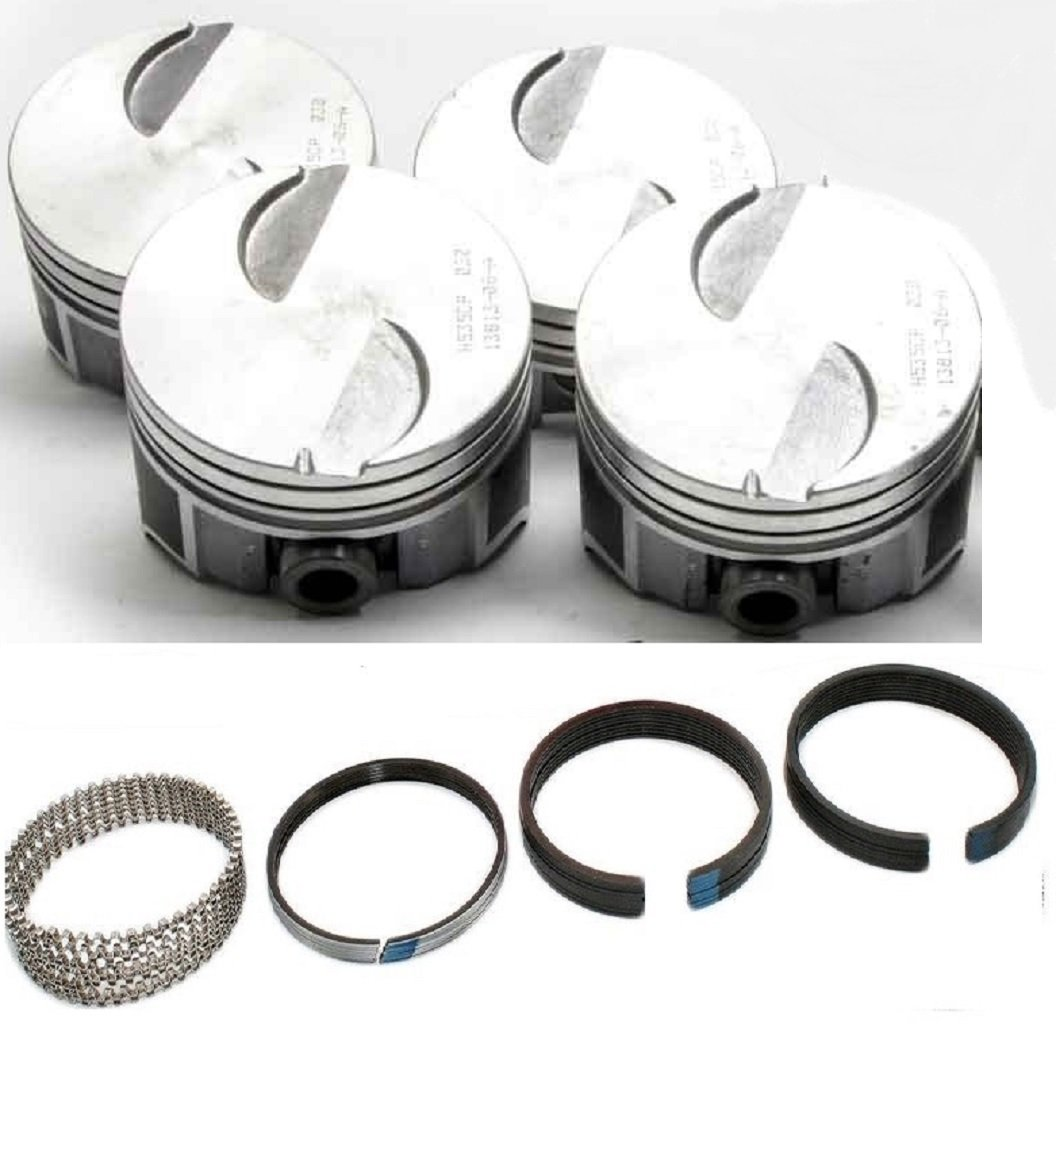 Mercruiser 470 470R 488R Ford 3.7 3.7L 224 Hypereutectic Piston+Ring Kit 4.360' Bore Sealed Power/Perfect Circle